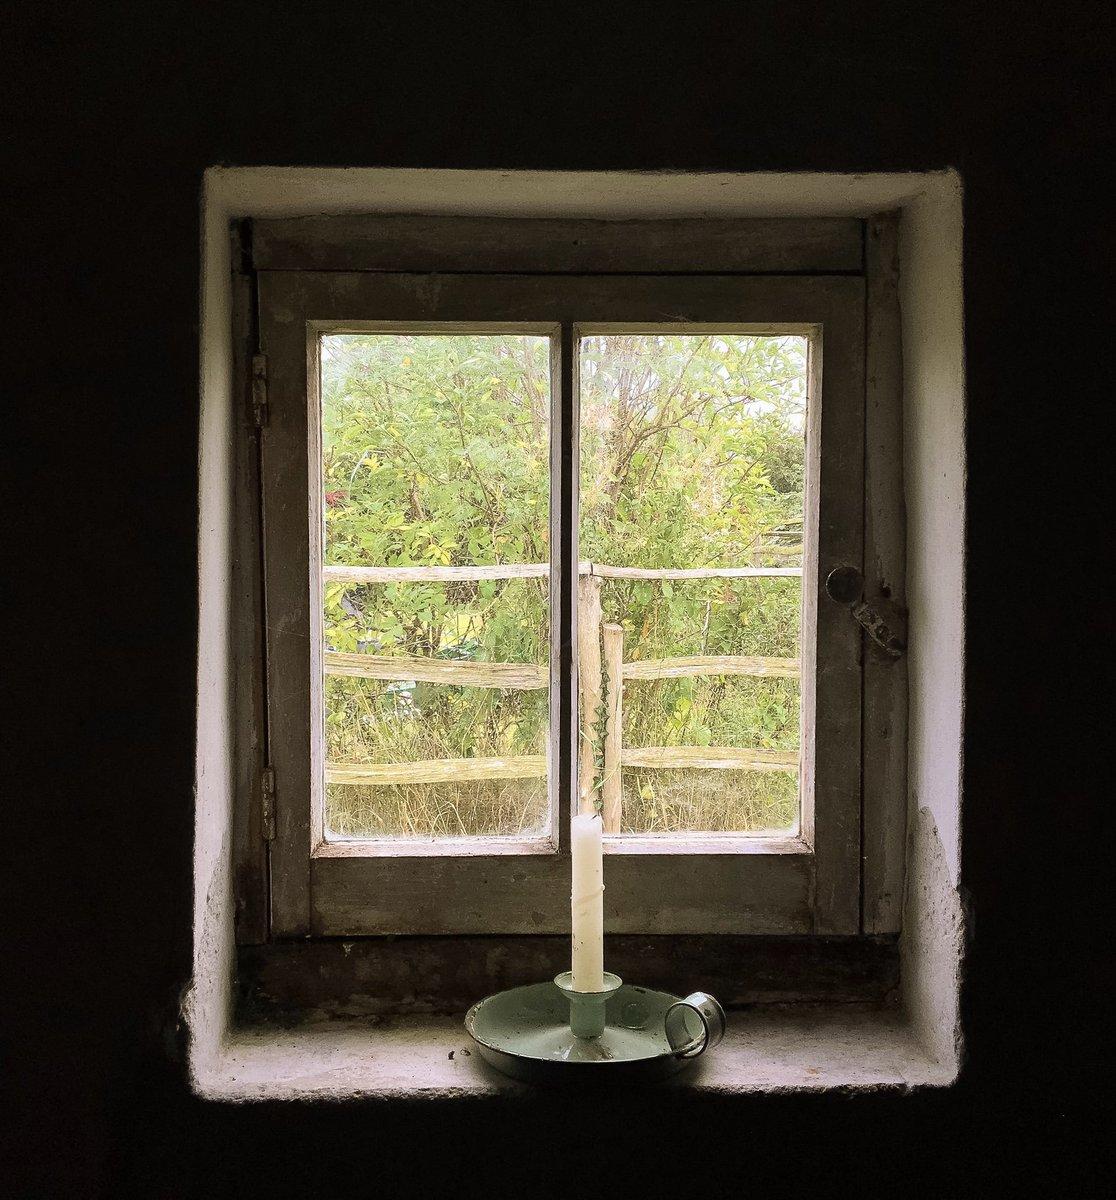 #wickenfen #nationaltrust #cambridgeshire #horseshoe #duck #window #candle @WickenFenNT @nationaltrust https://t.co/MUMlMPsaOj